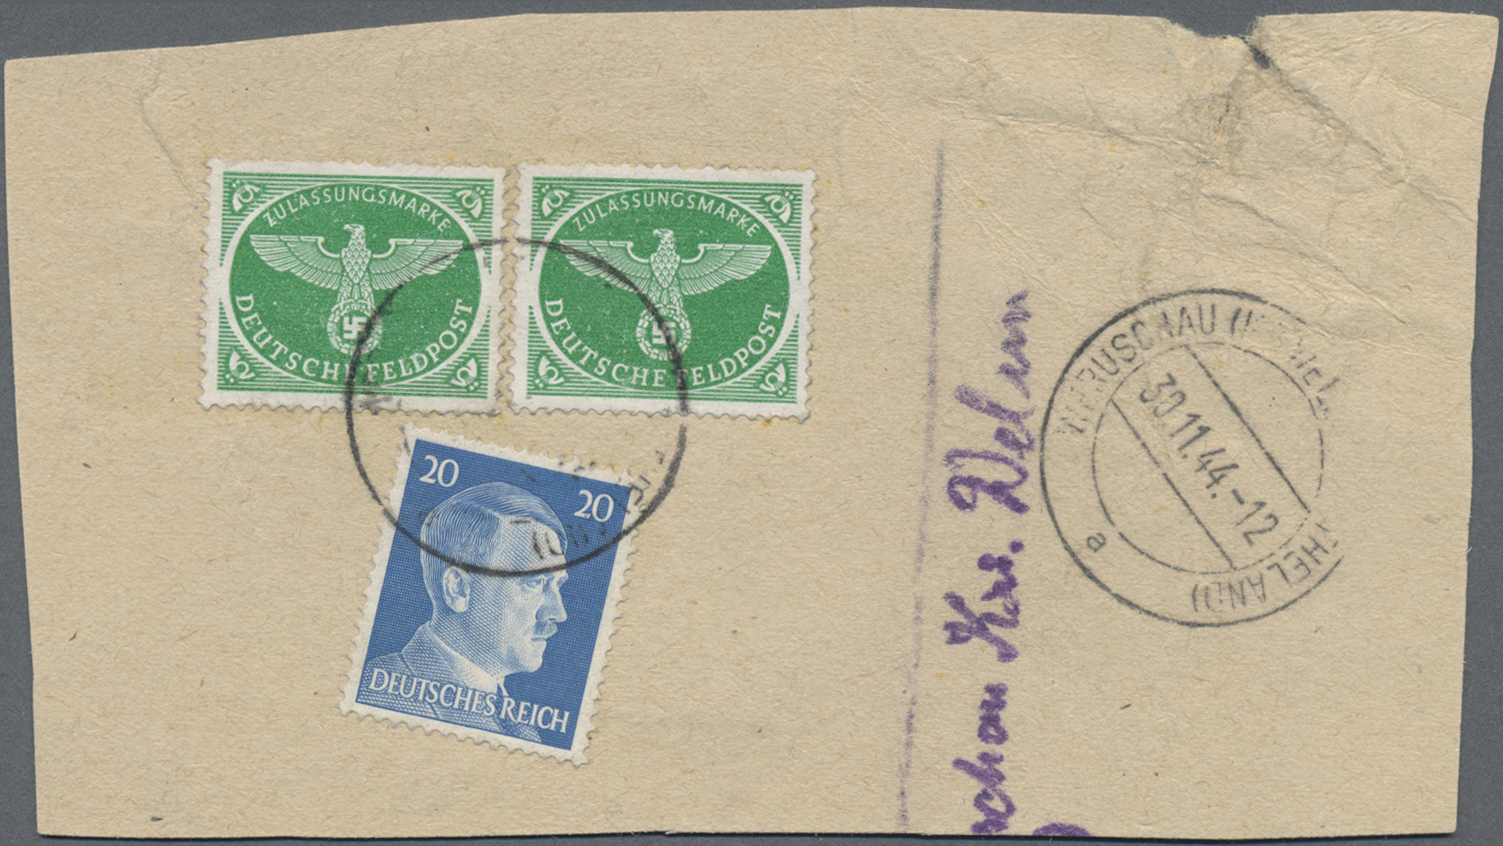 Lot 37140 - feldpostmarken  -  Auktionshaus Christoph Gärtner GmbH & Co. KG Sale #44 Collections Germany